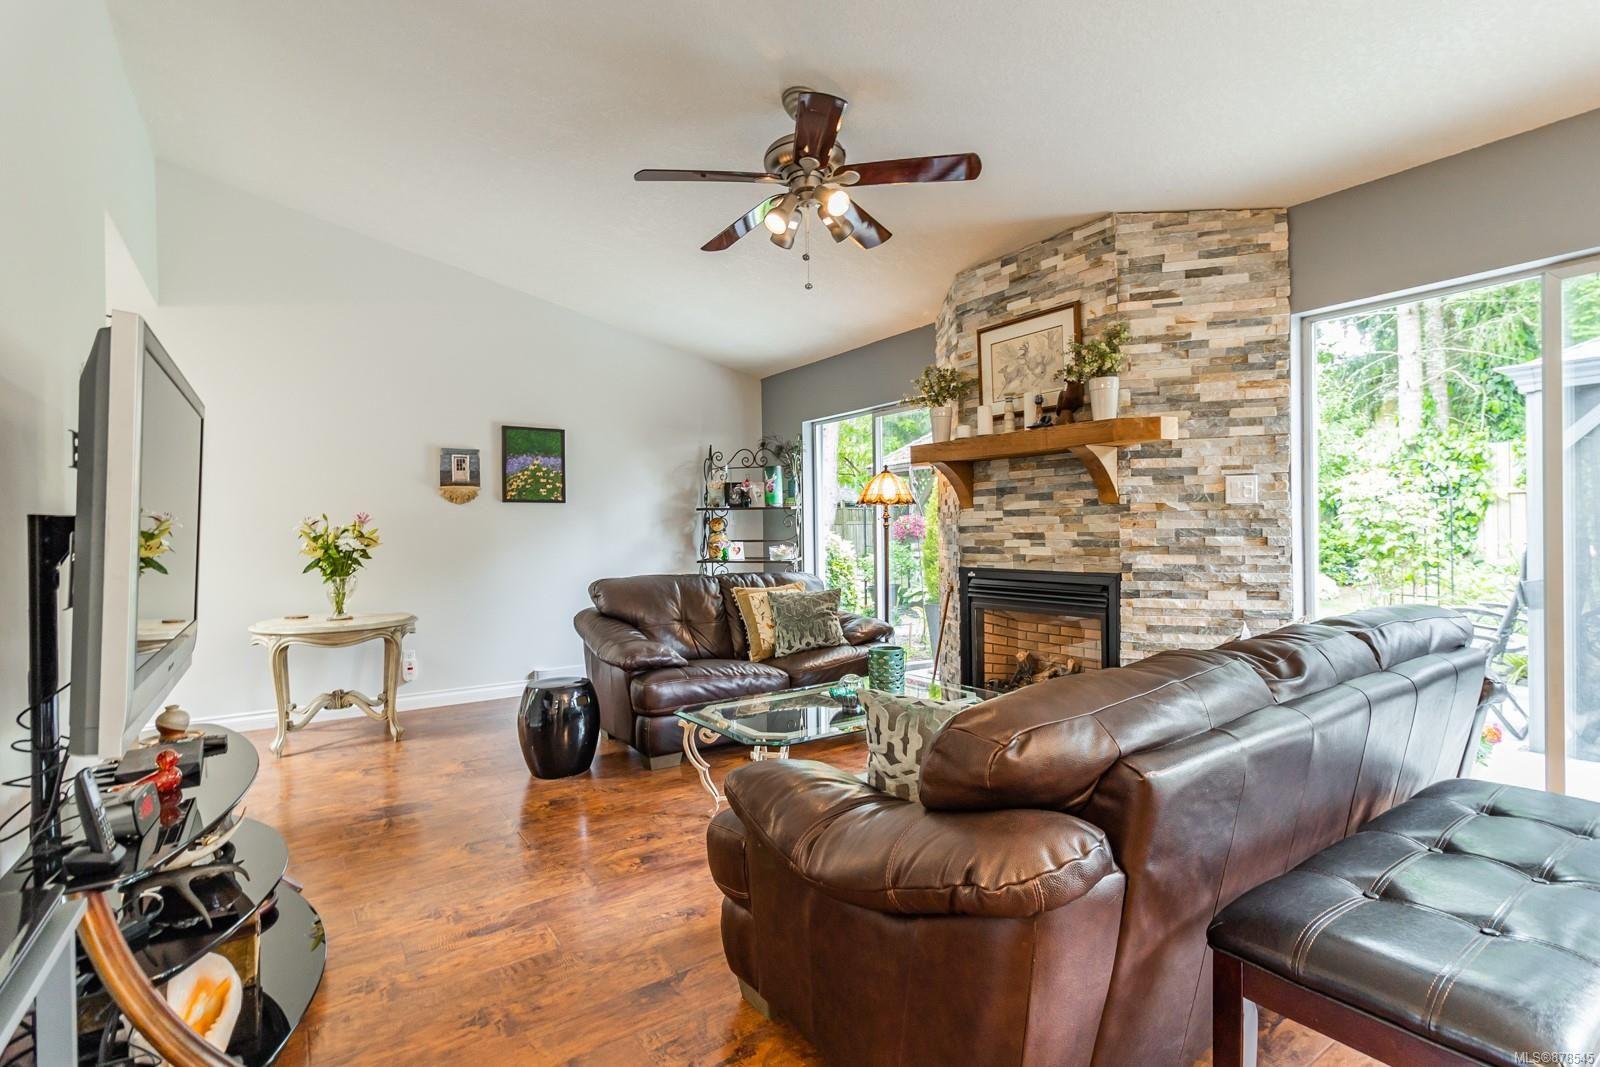 Photo 14: Photos: 1070 Symons Cres in : PQ Qualicum Beach House for sale (Parksville/Qualicum)  : MLS®# 878545